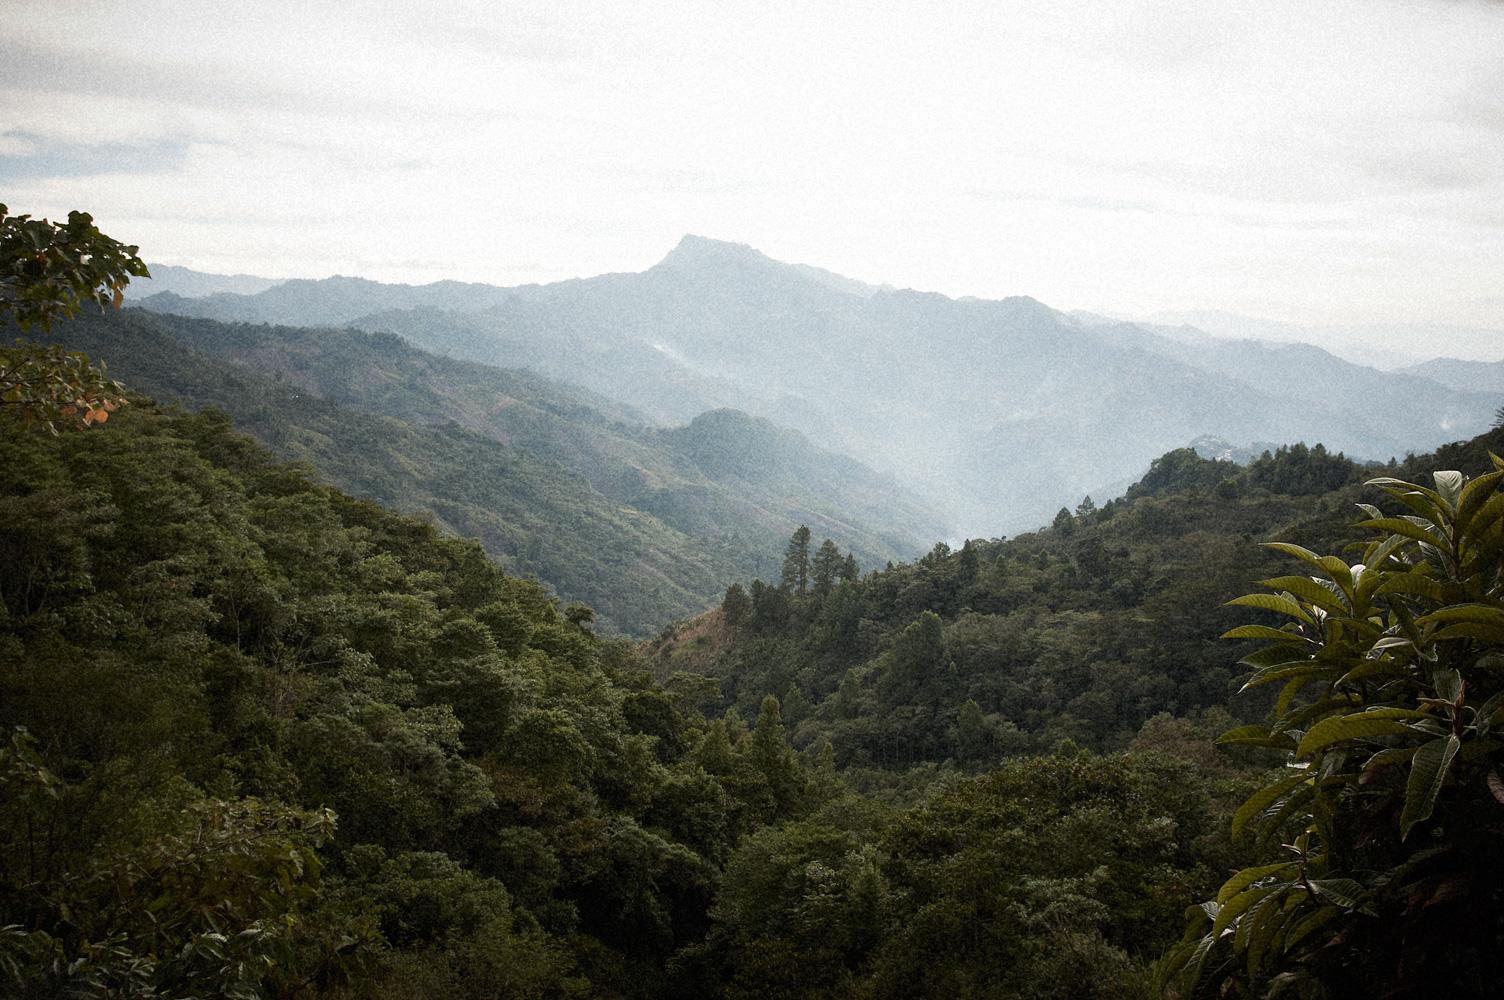 Acteal_Mountain_©Kristina_Steiner